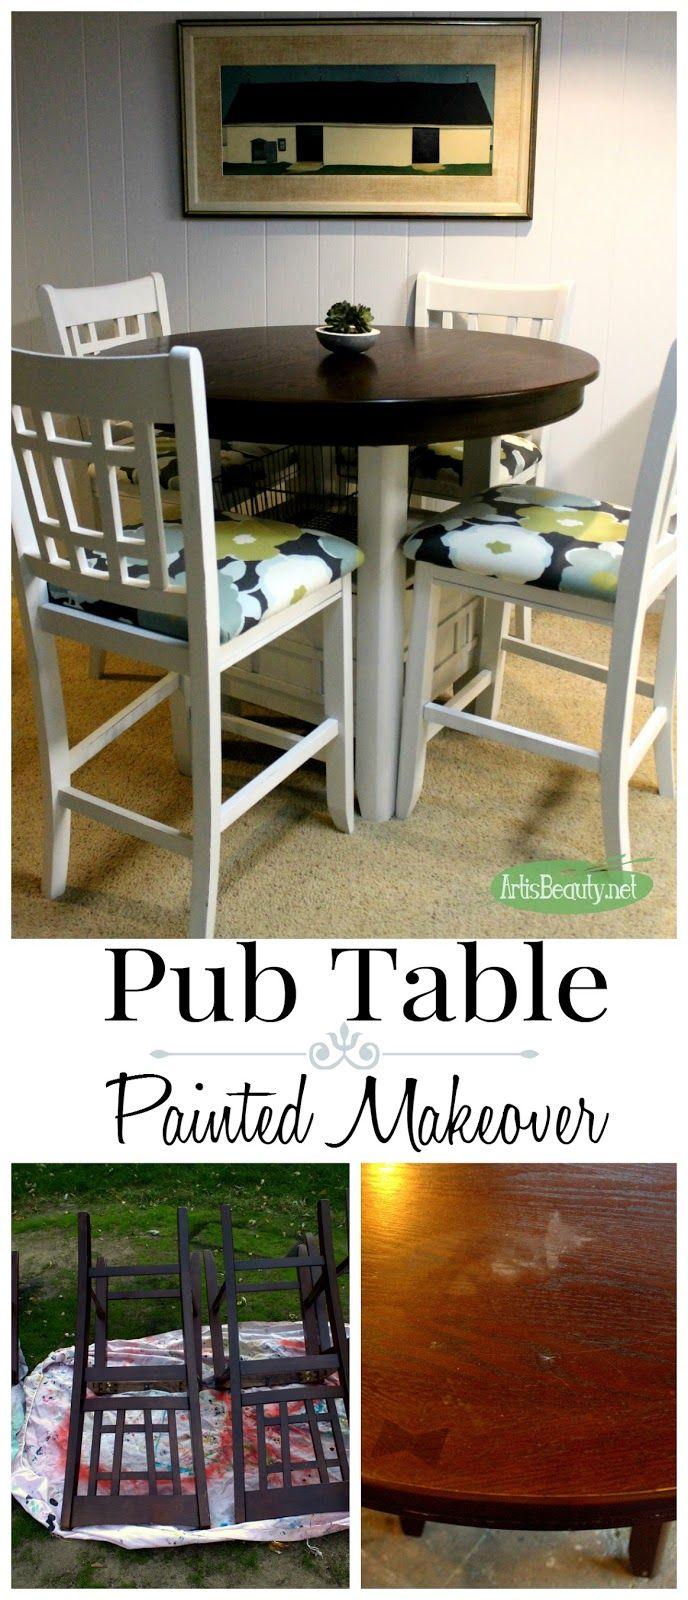 25+ Best Pub Tables Ideas On Pinterest | Barrel Table, Barrel Furniture And  Whiskey Barrels